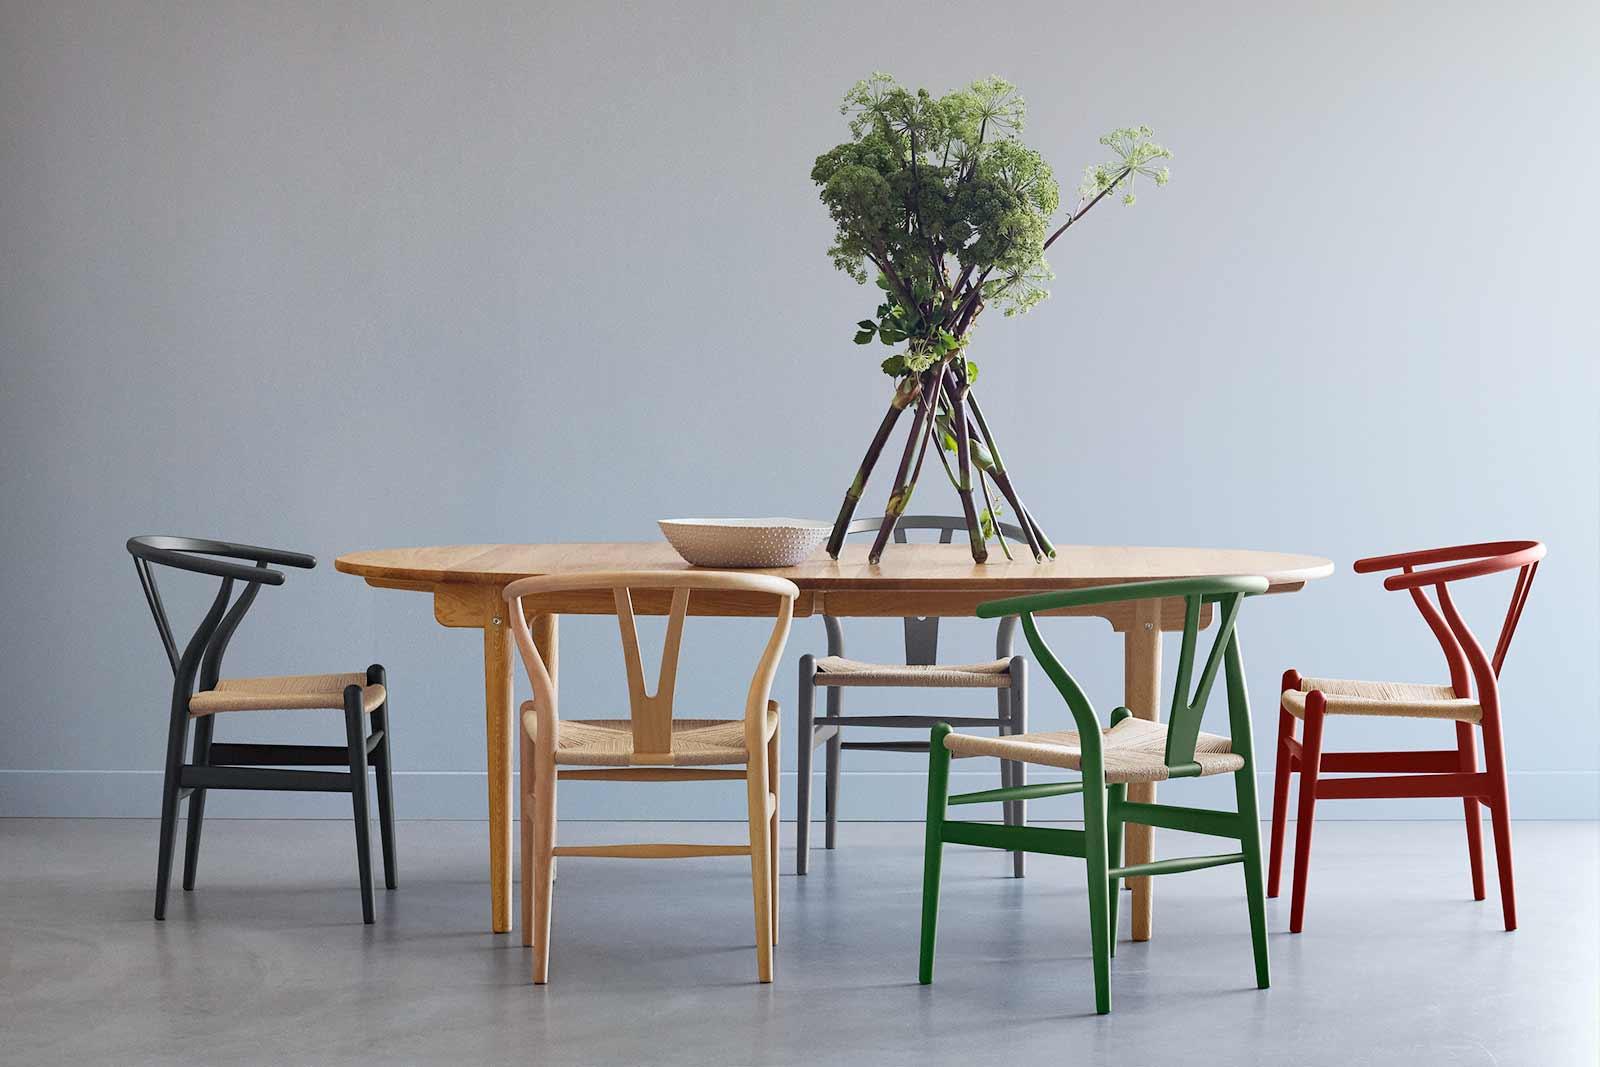 CH24 Soft Wishbone Chair Special Edition Boutique Danoise Basel Daenische Designe _Moebel Accessoires Wohnen News